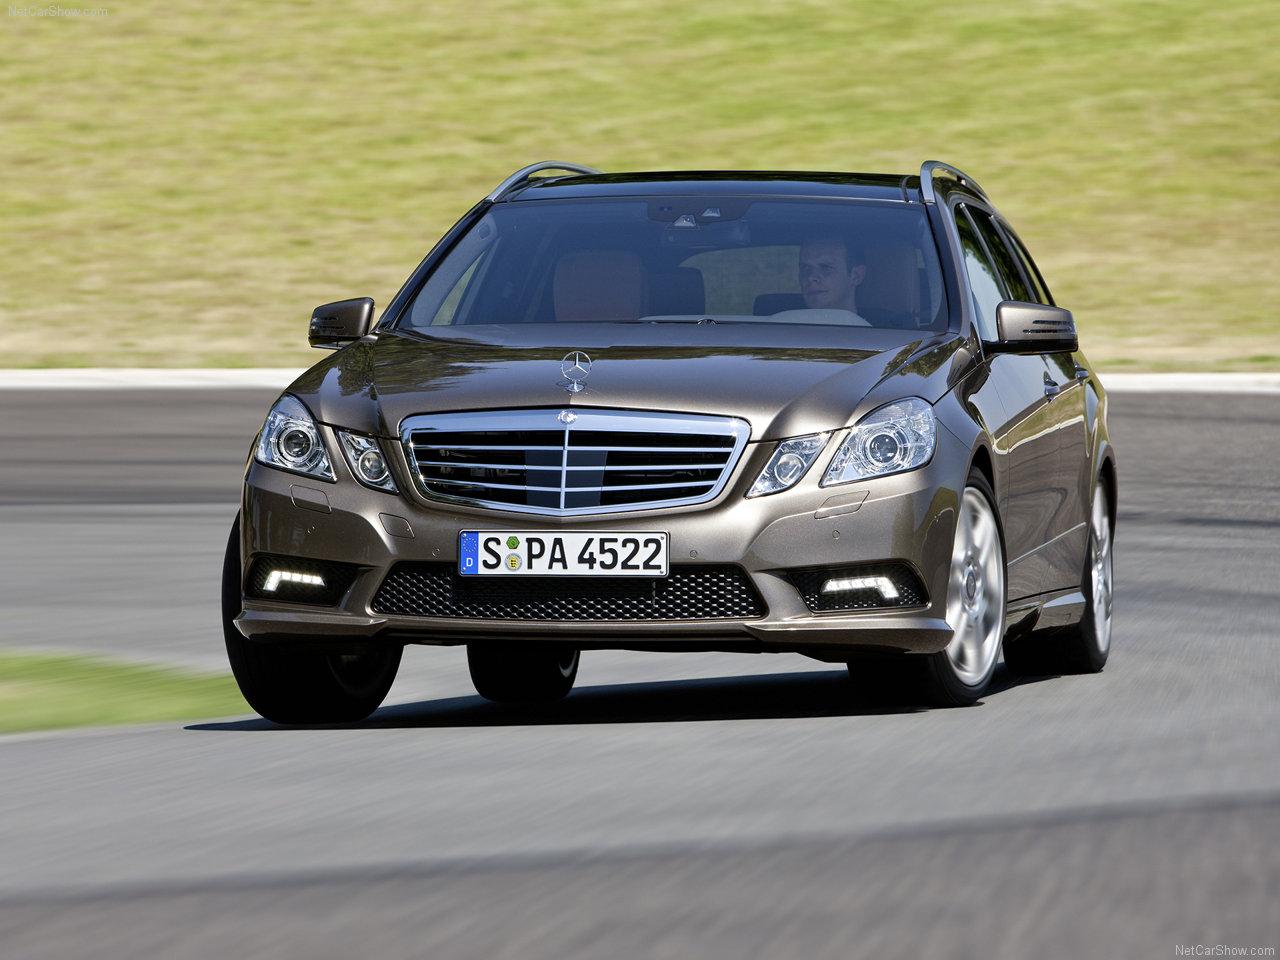 http://4.bp.blogspot.com/-XPAw9Tx5BjU/TWX7_PboBsI/AAAAAAACK4w/c67QuolgUj4/s1600/Mercedes-Benz-E-Class_Estate_AMG_Sports_Package_2010_1280x960_wallpaper_04.jpg